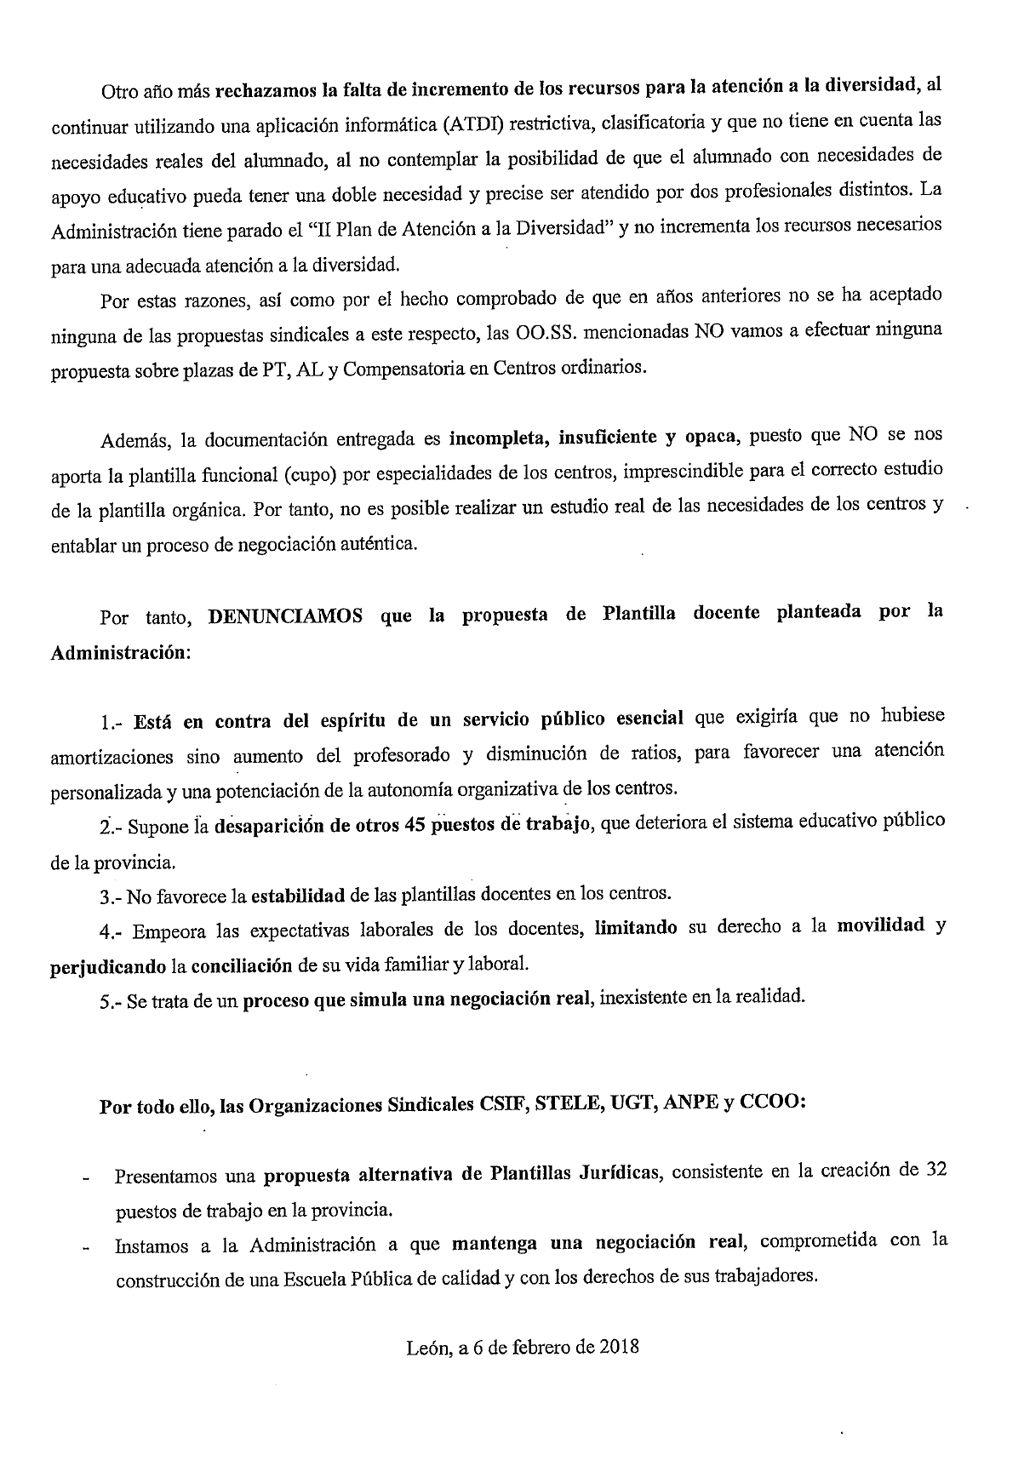 Comunicado-OOSS-Negociacion-Plantillas-LE-02